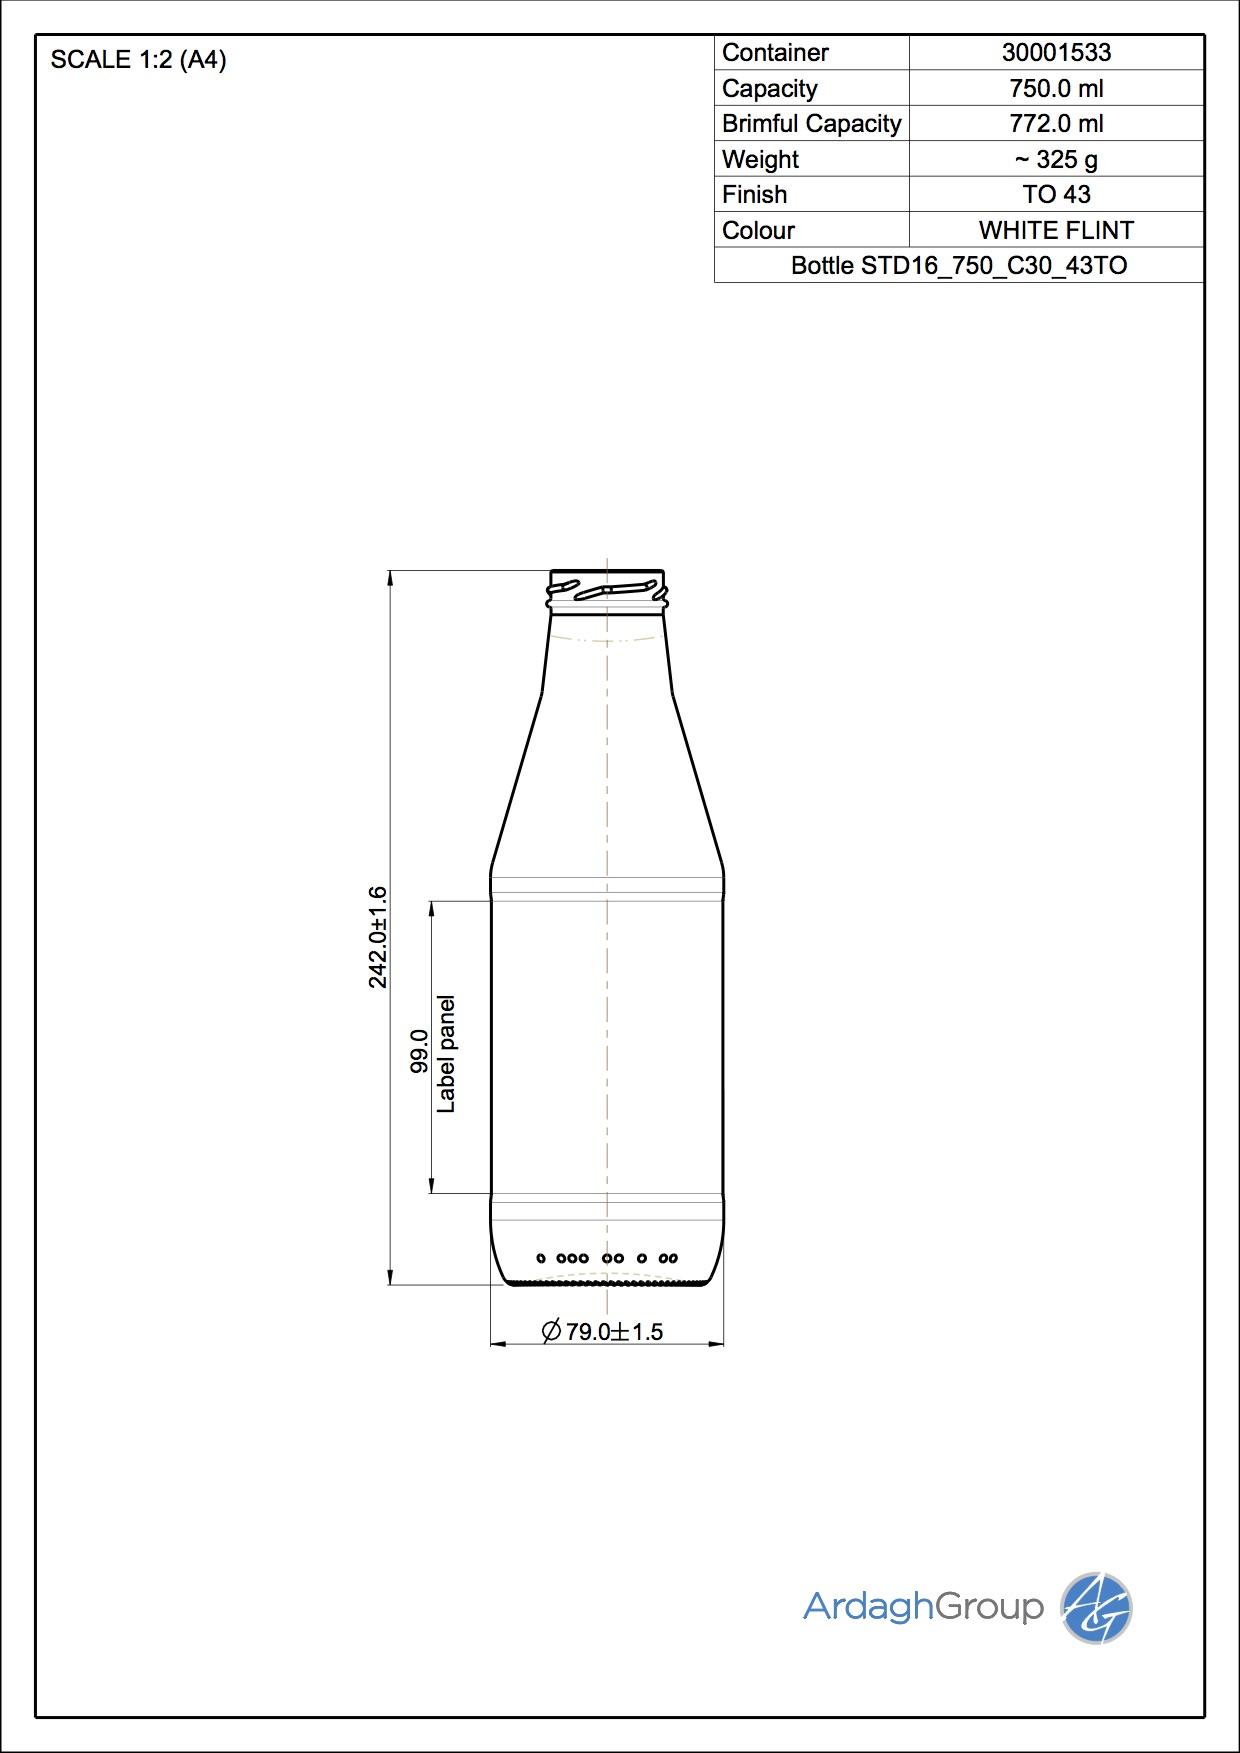 Bottle STD16 750 C30 43TO